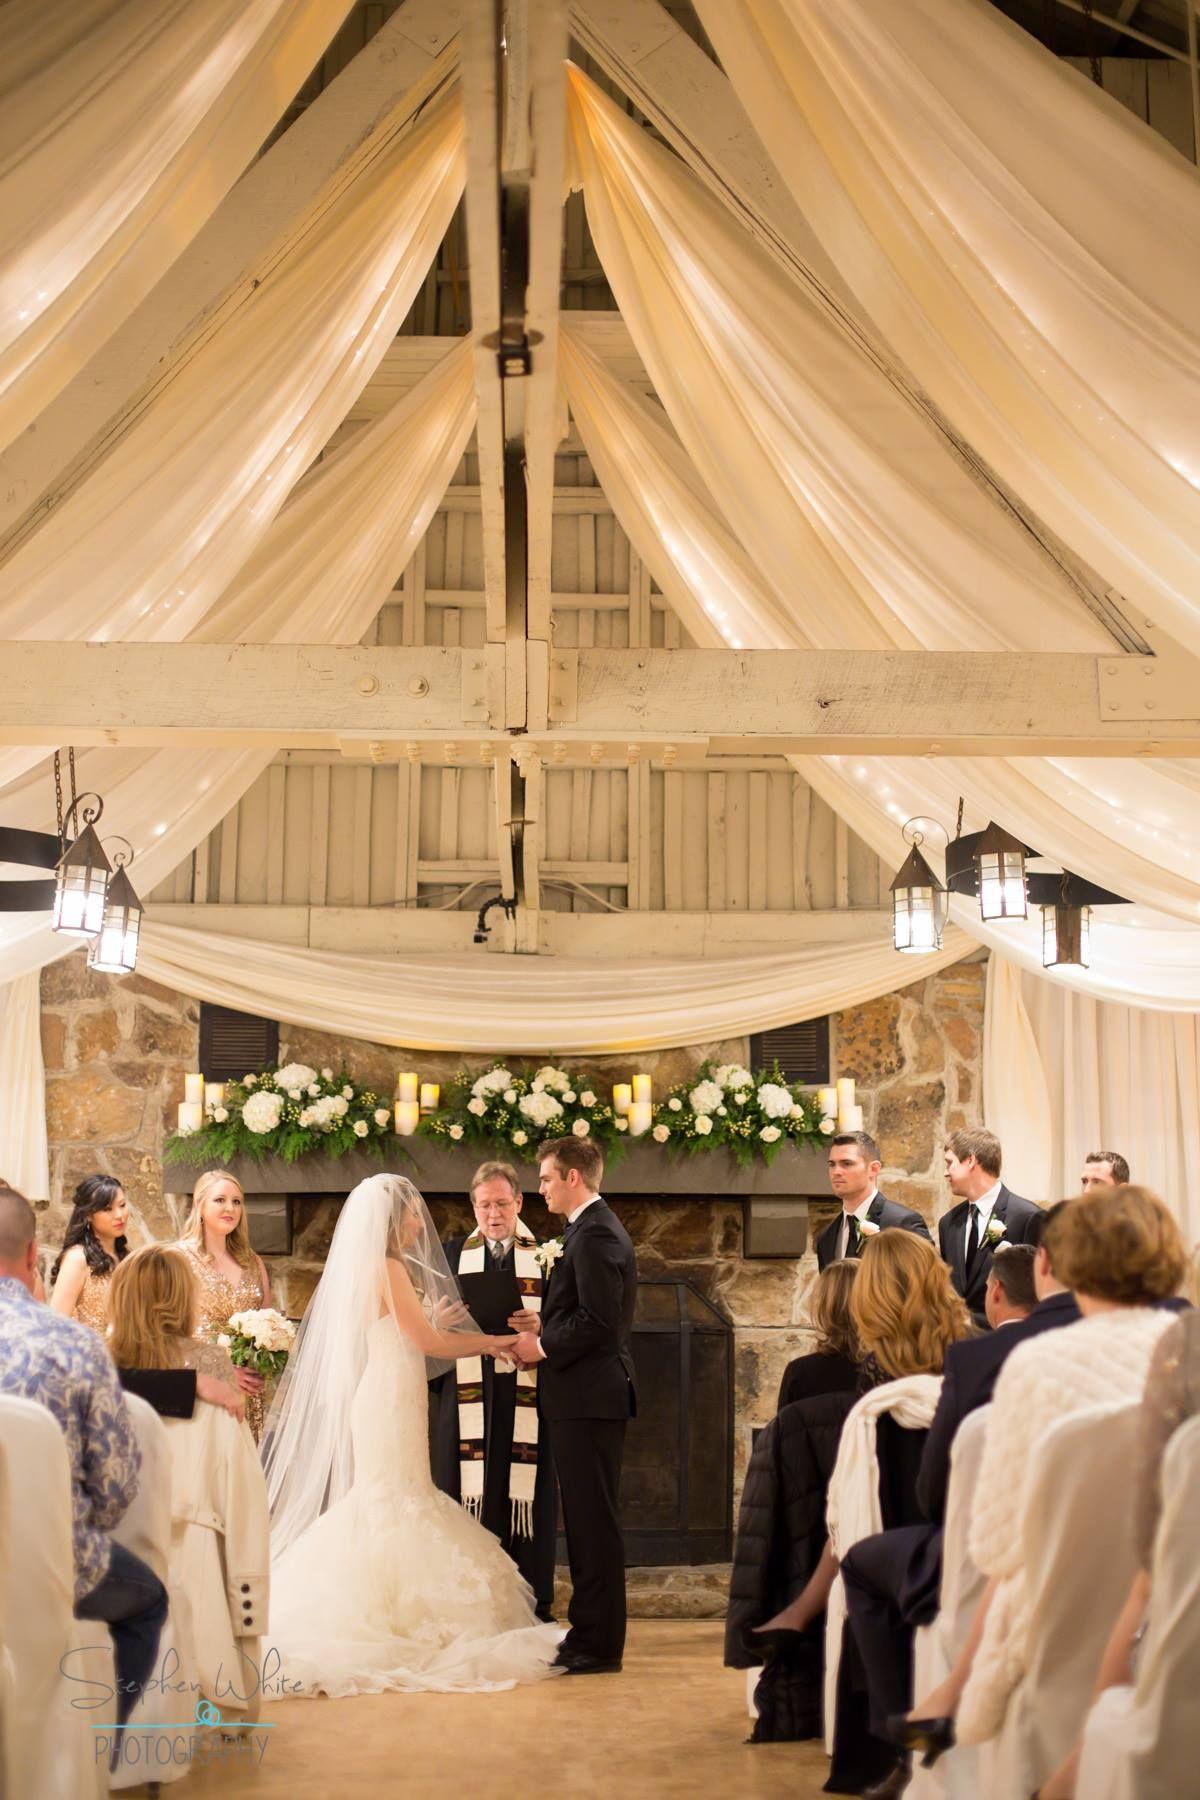 Mountain Lake Lodge Weddings // Destination Wedding Venue